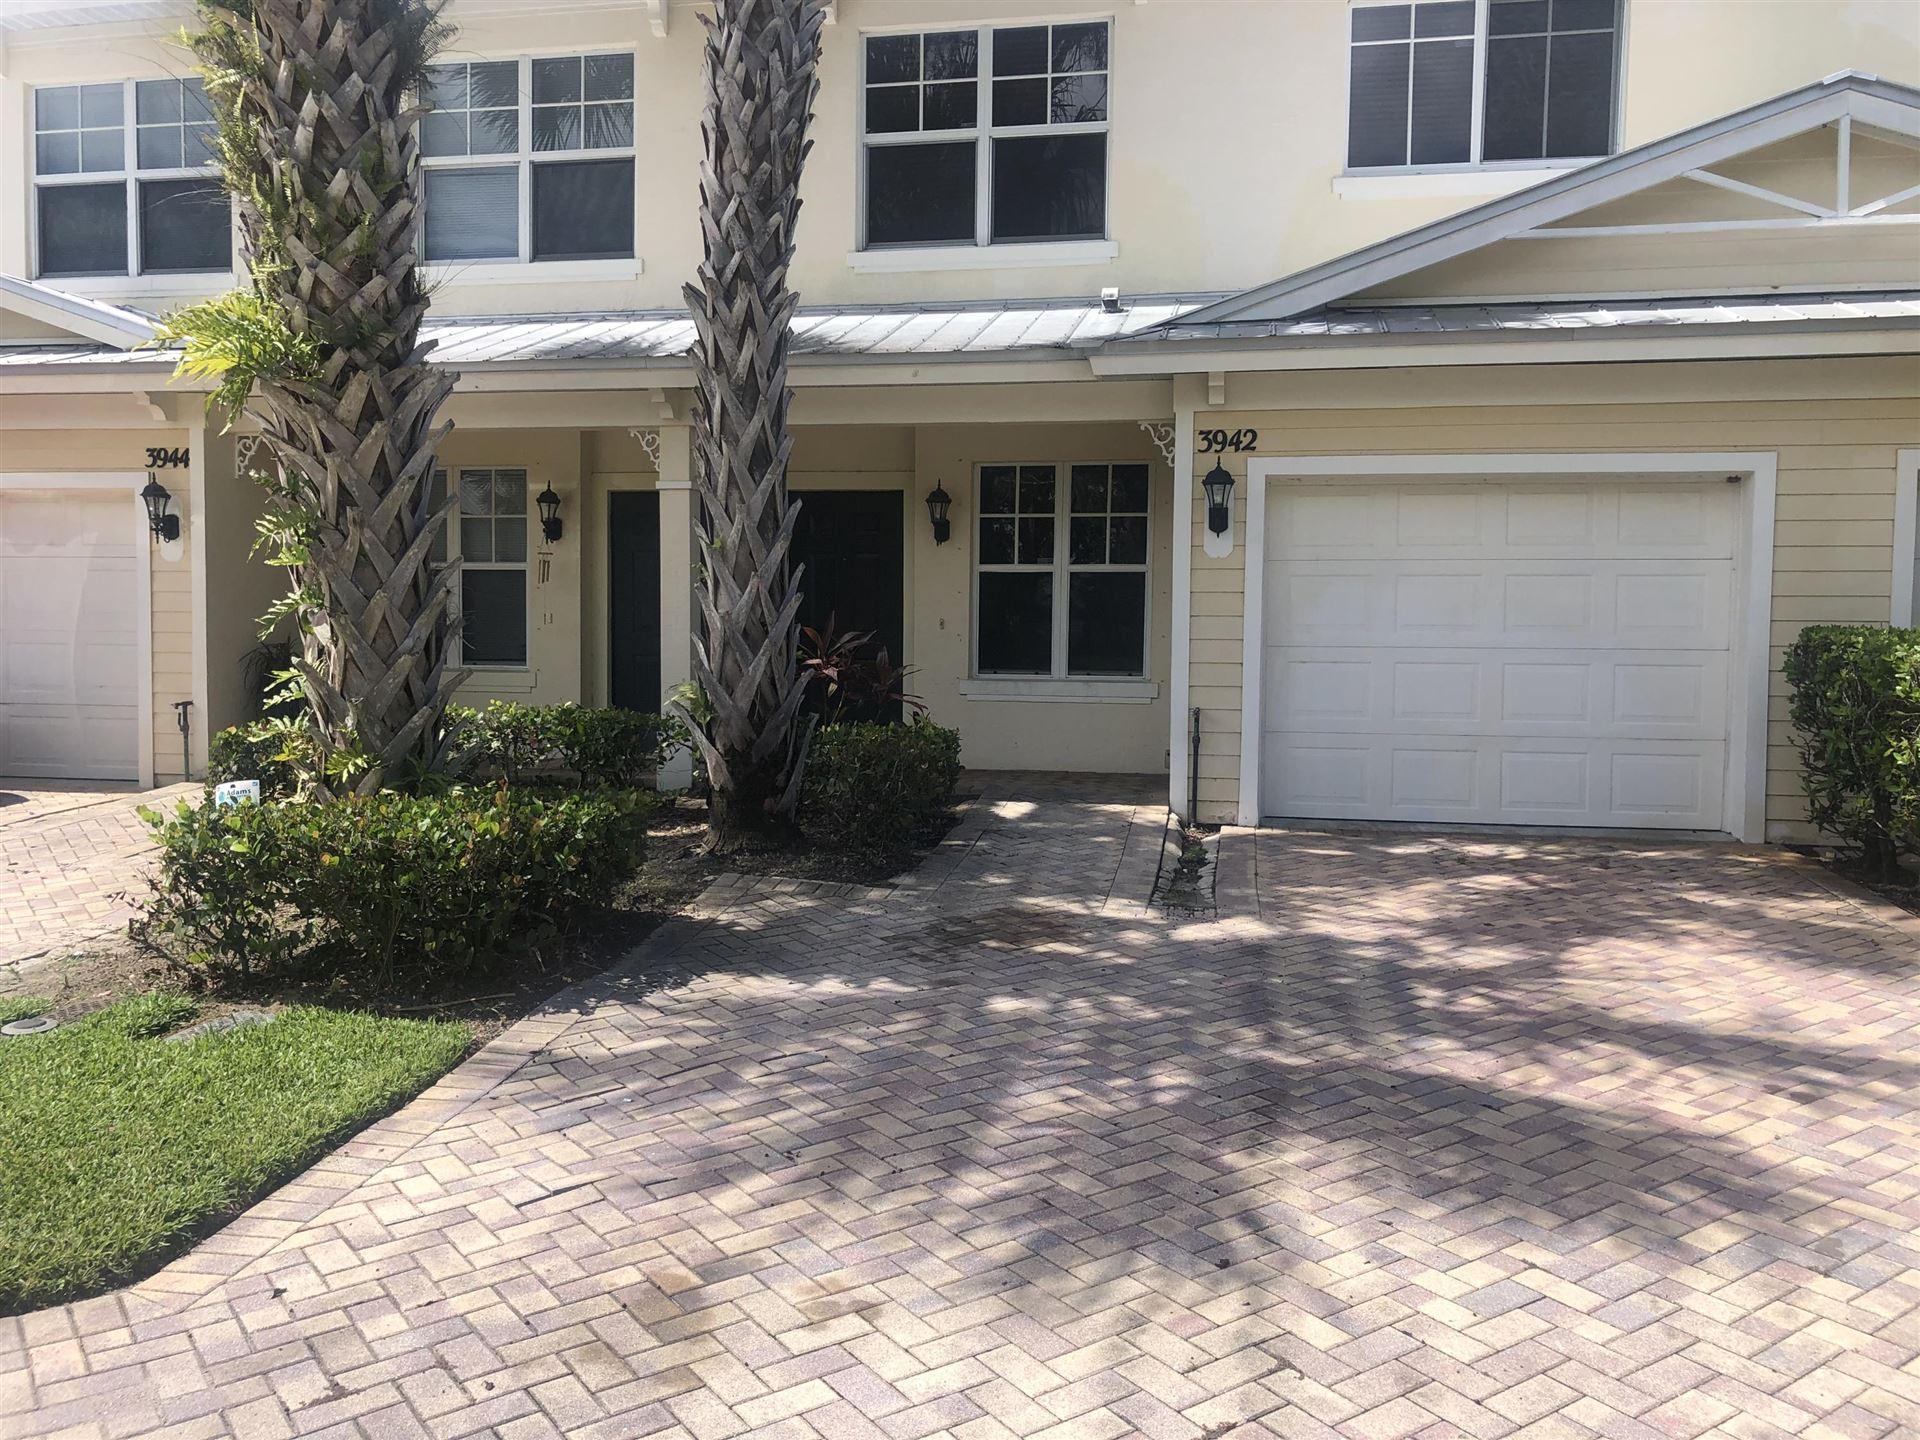 3942 Sabal Way, Fort Pierce, FL 34981 - #: RX-10653240